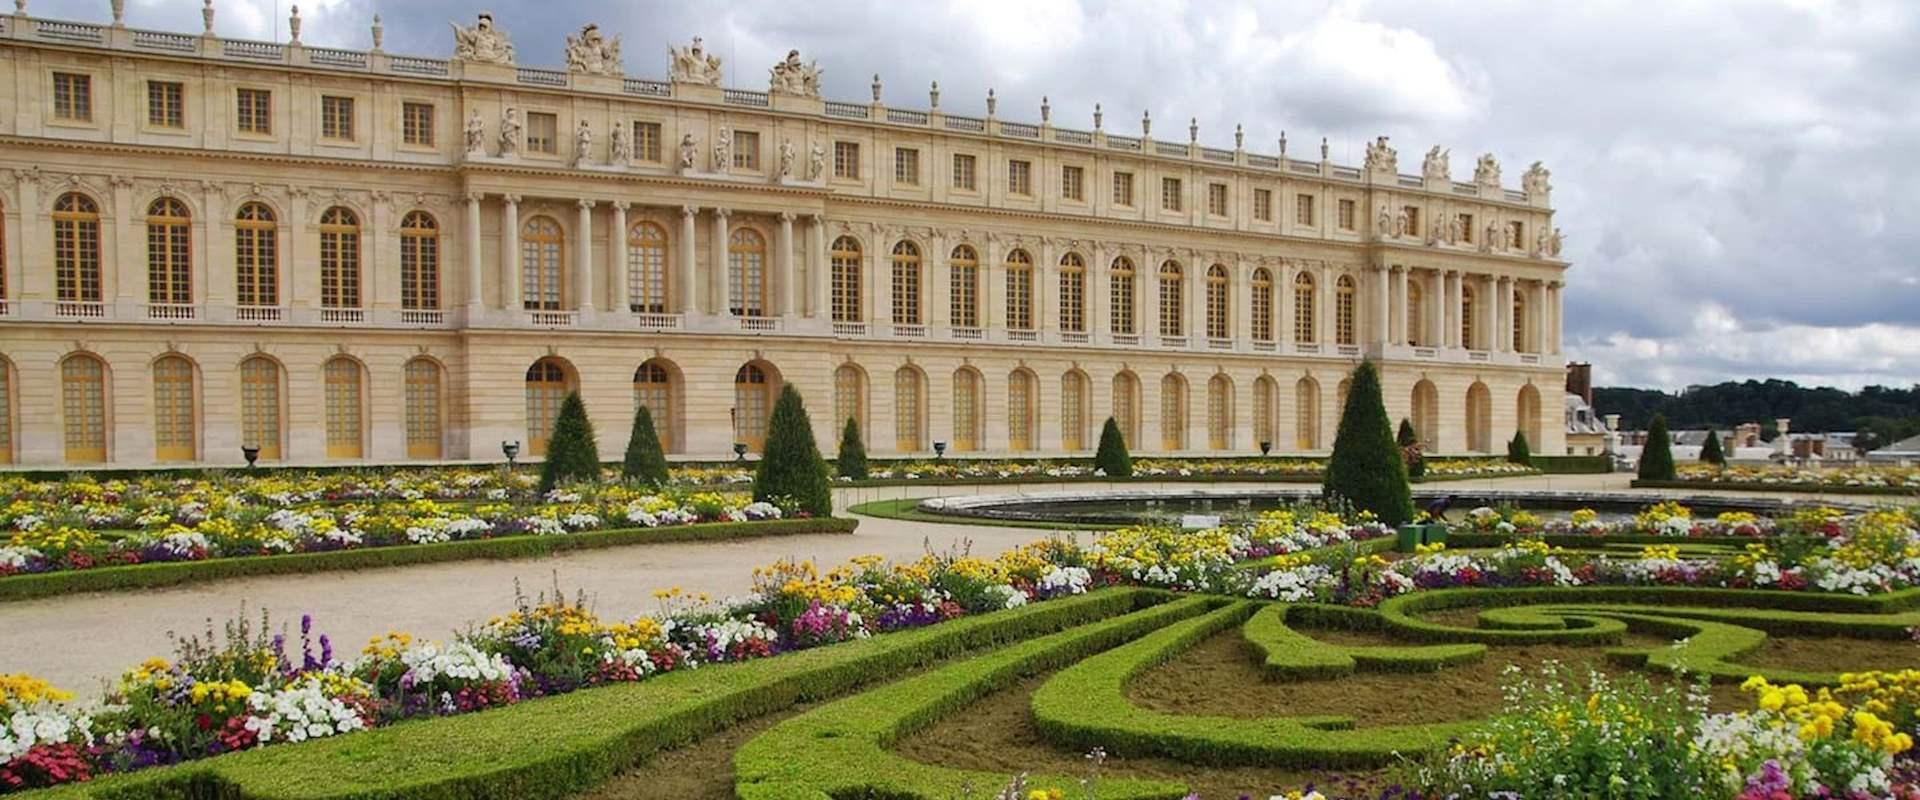 Versailles Palace & Garden Tour Tickets from Versailles - City Wonders